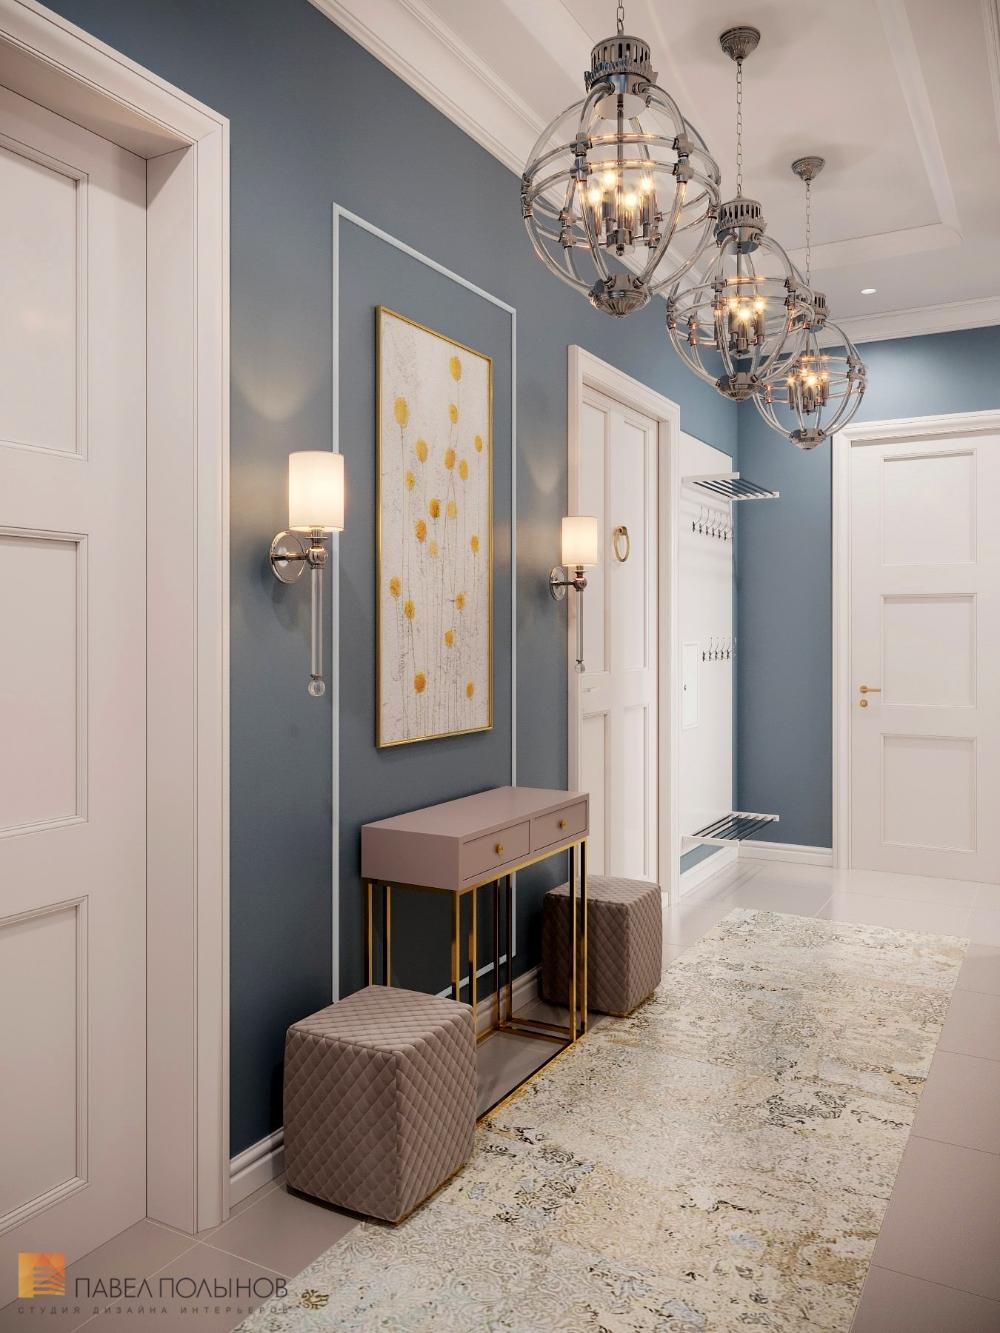 Photo of Фото: Дизайн холла – Дизайн интерьера квартиры в ЖК «Look»,